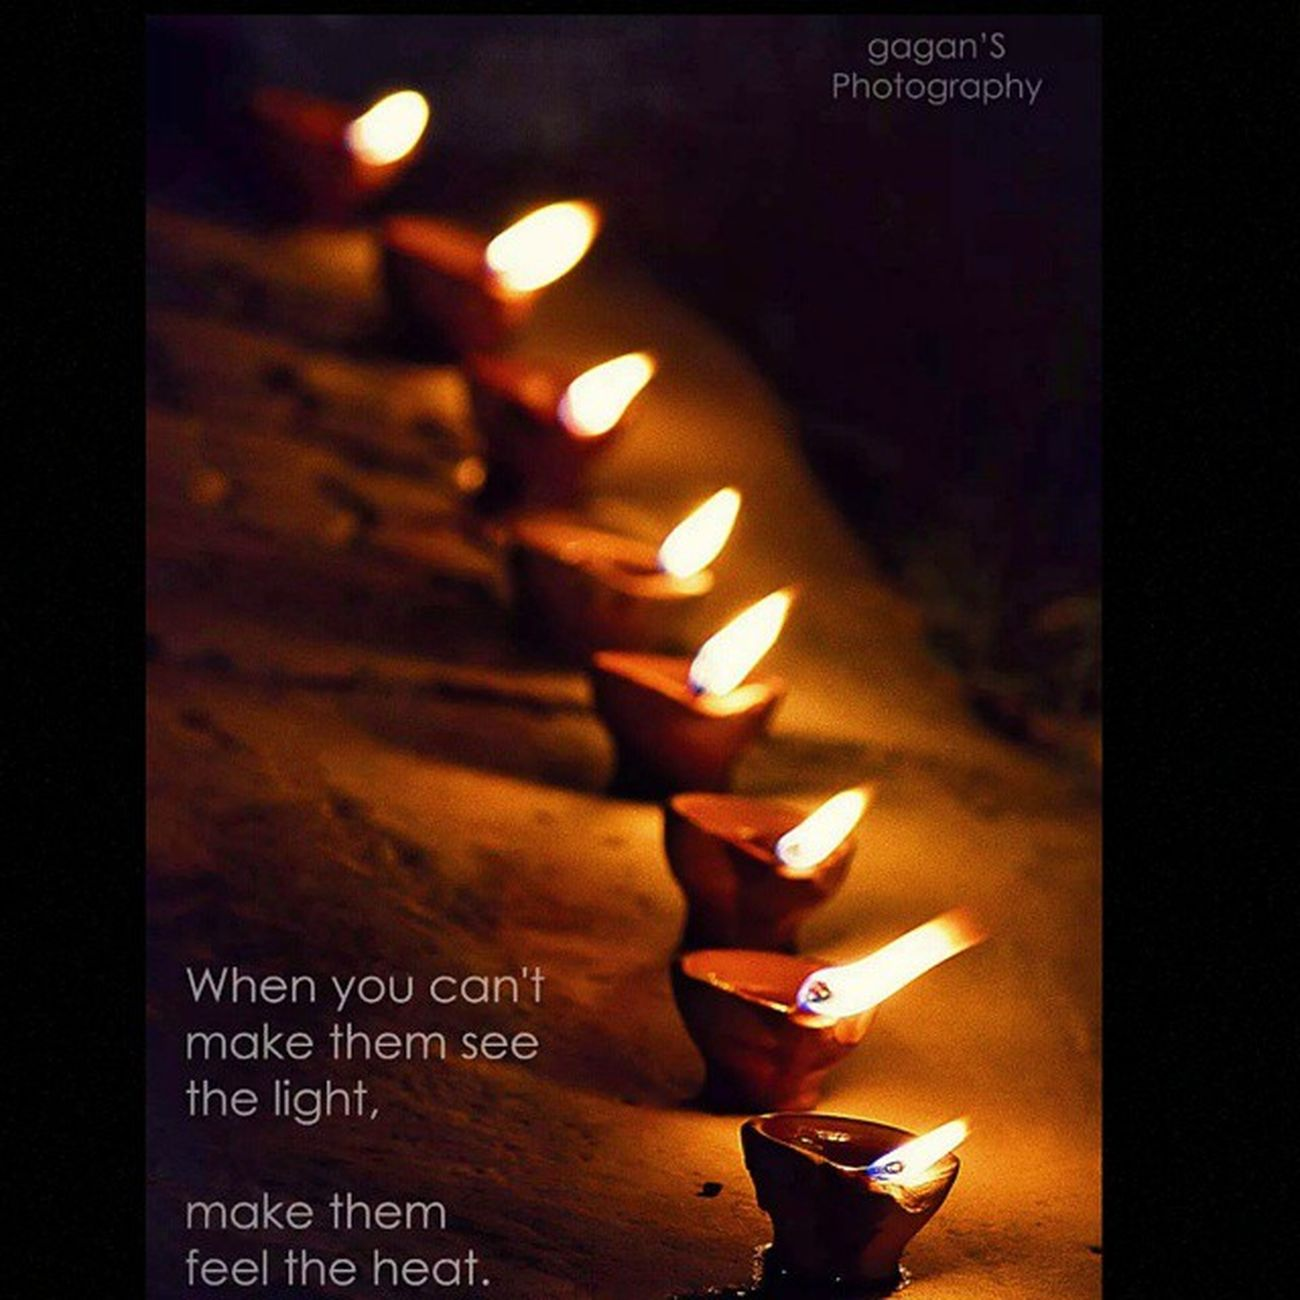 Diwali2014 Gagans_photography Blessings Gagans_photography